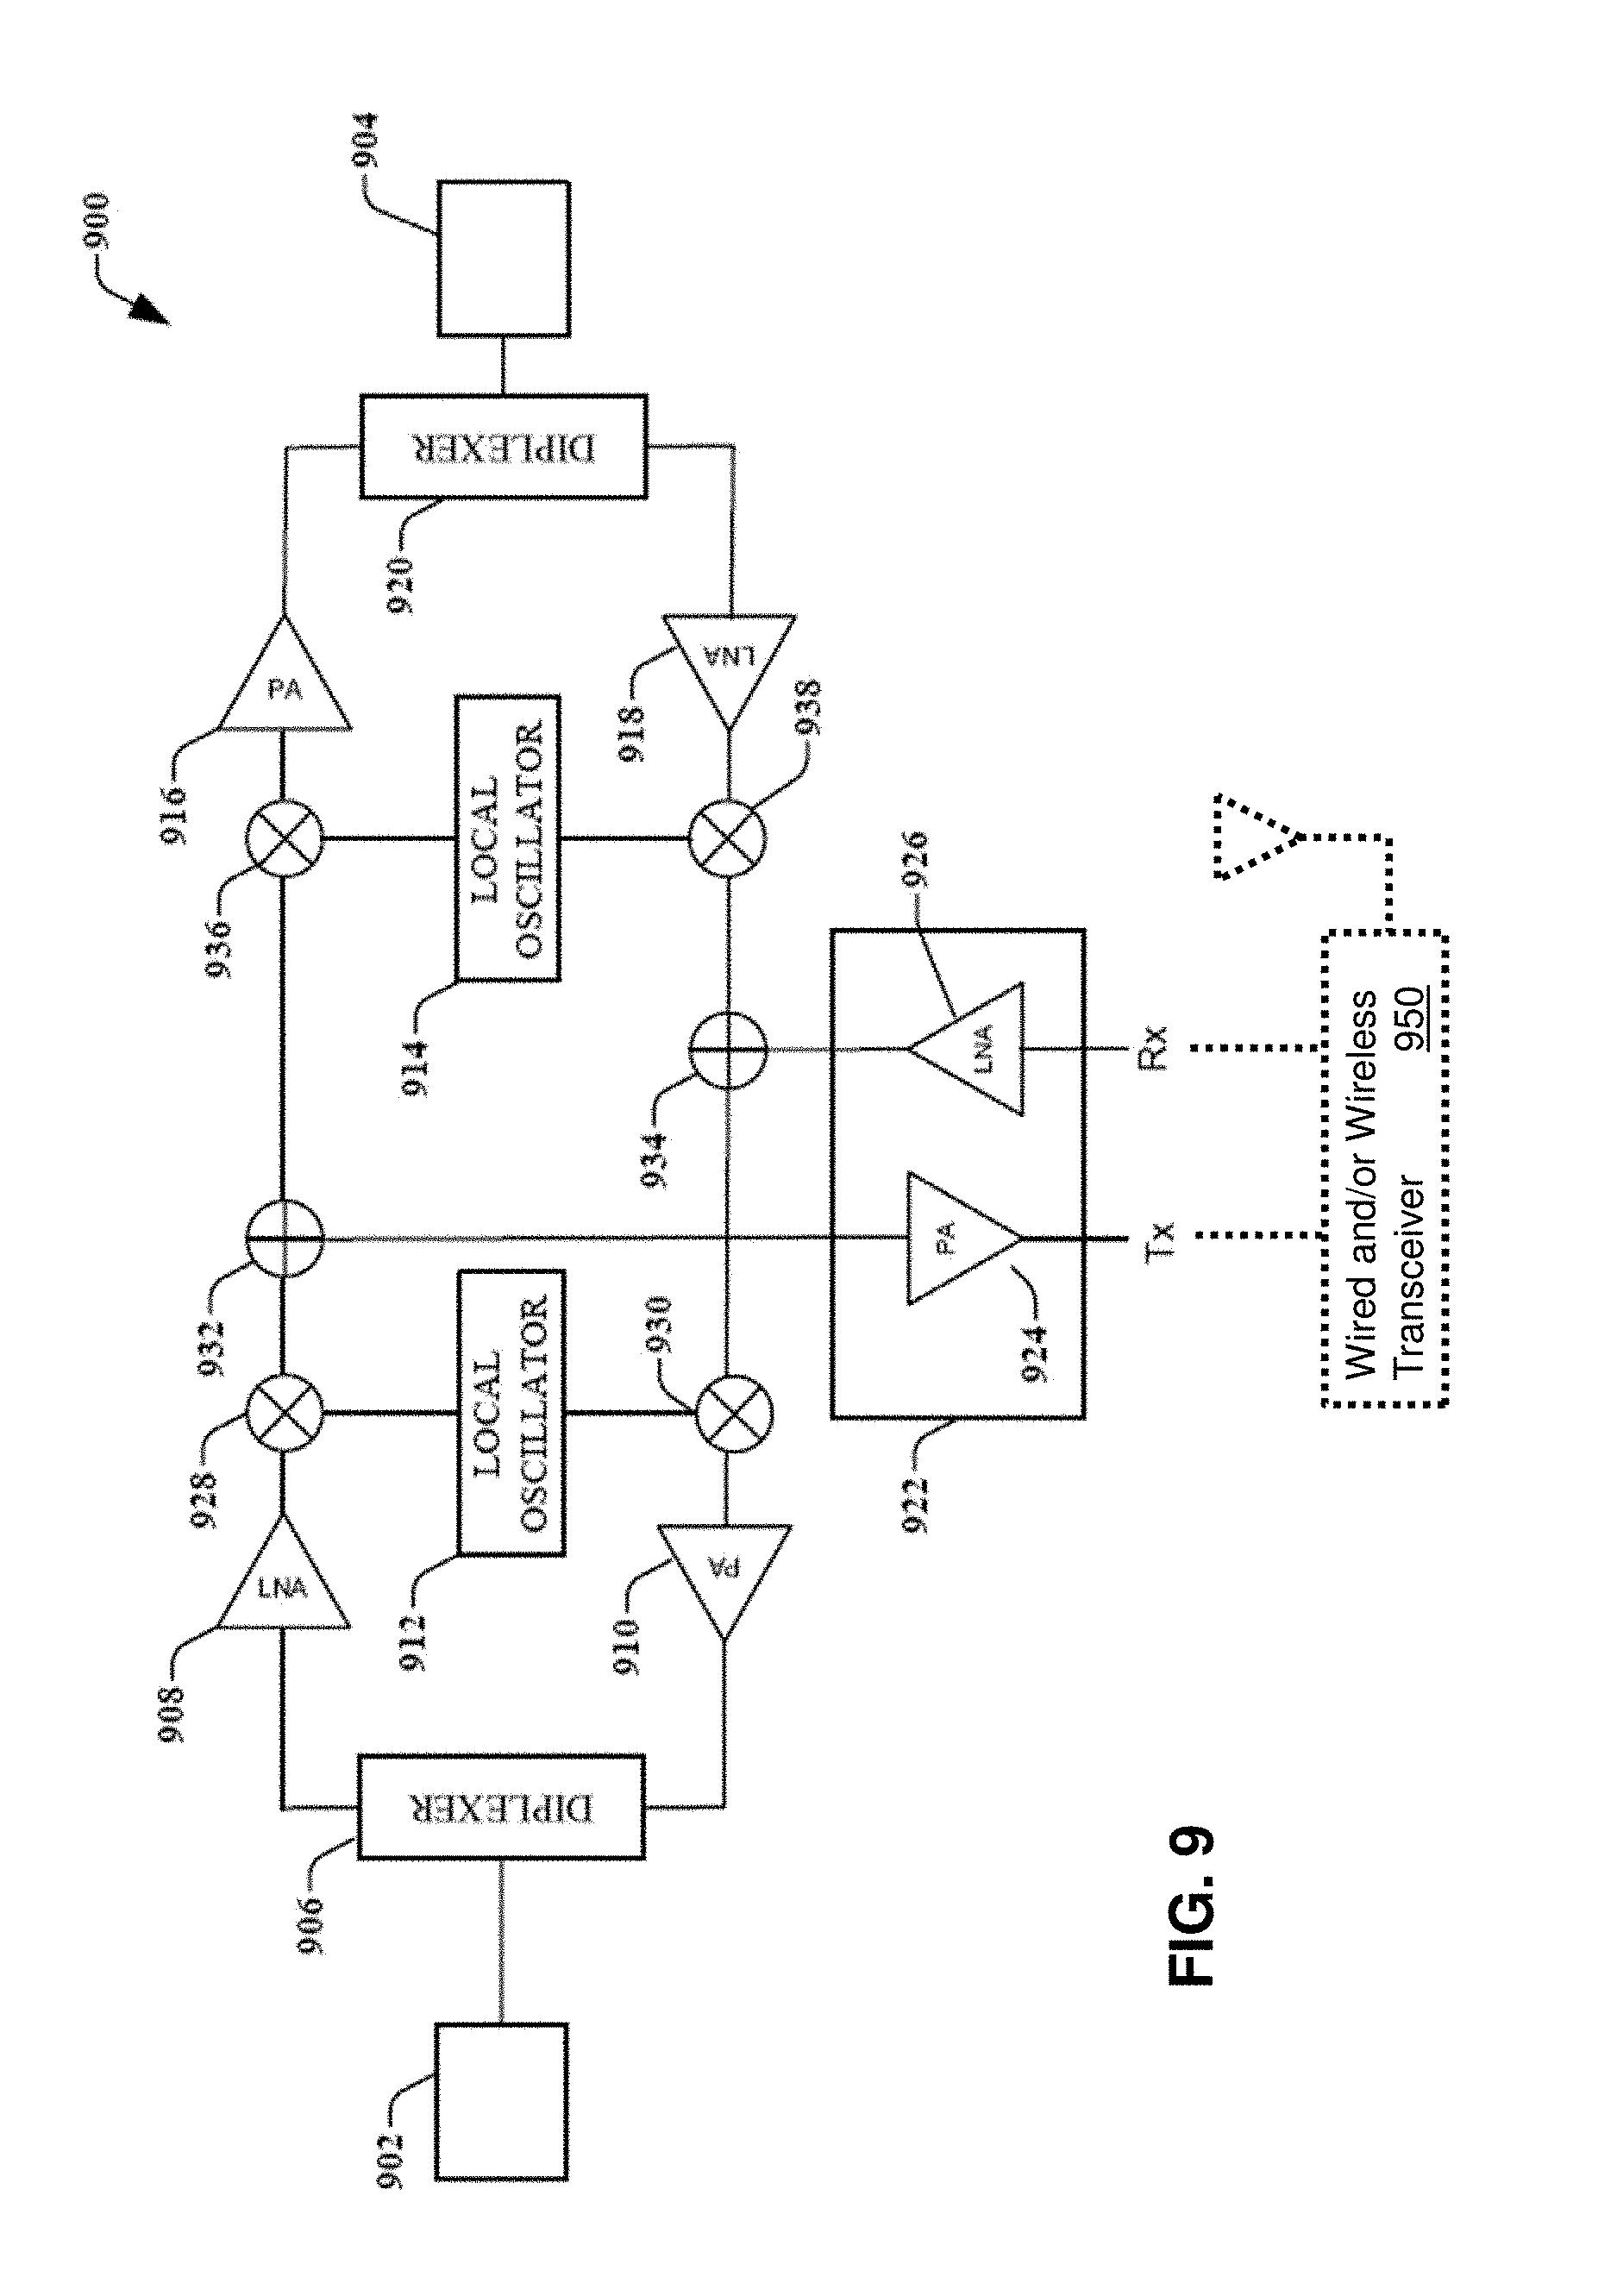 Us9780834b2 Method And Apparatus For Transmitting Electromagnetic Circuit Diagram Communication Motorola 2000 Cell Phone Waves Google Patents